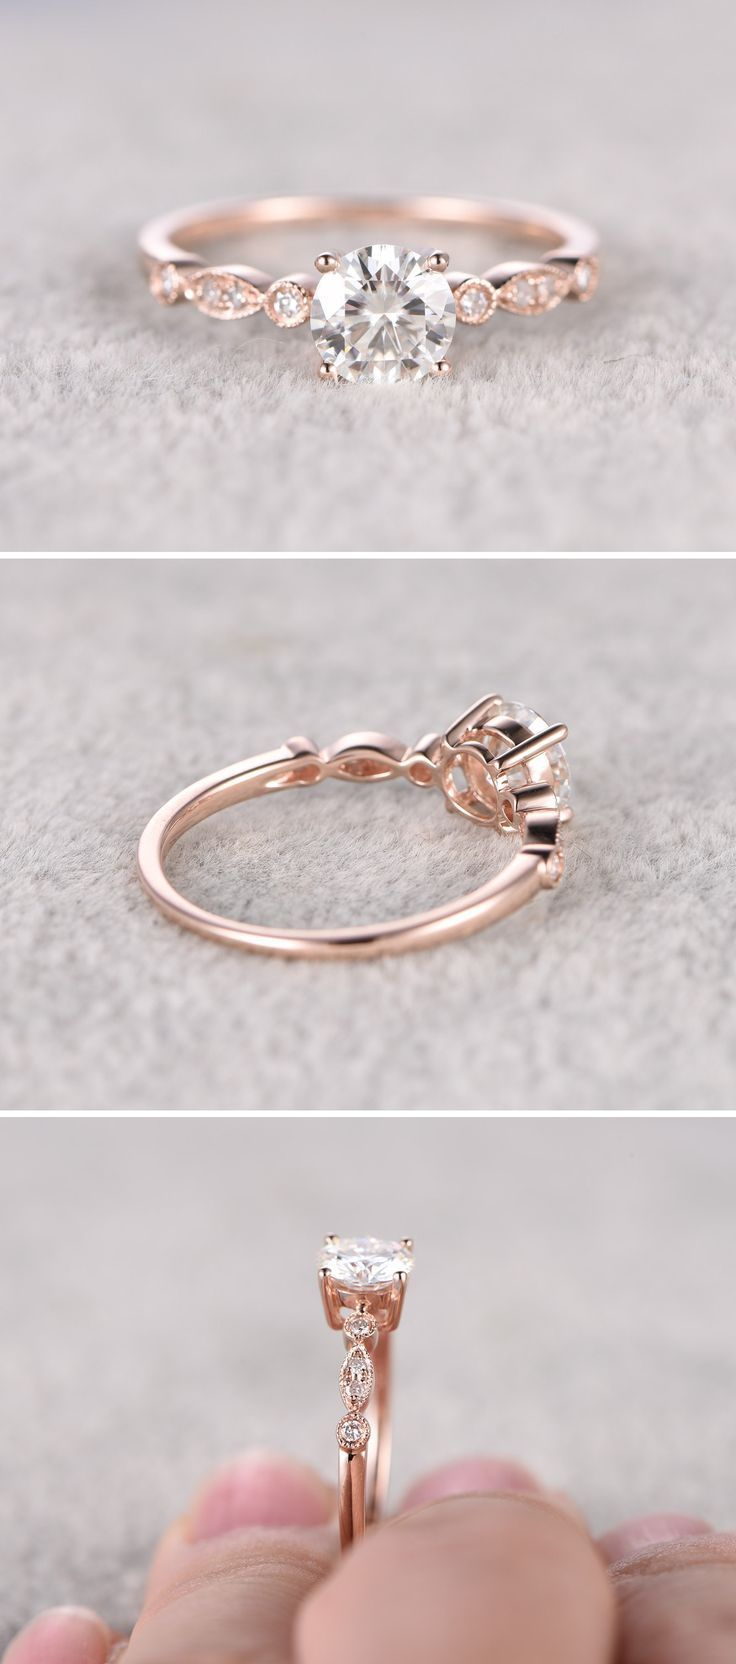 gold engagement rings pretty wedding rings 25 Best Ideas about Gold Engagement Rings on Pinterest Pretty engagement rings Silver band wedding rings and Silver band engagement rings